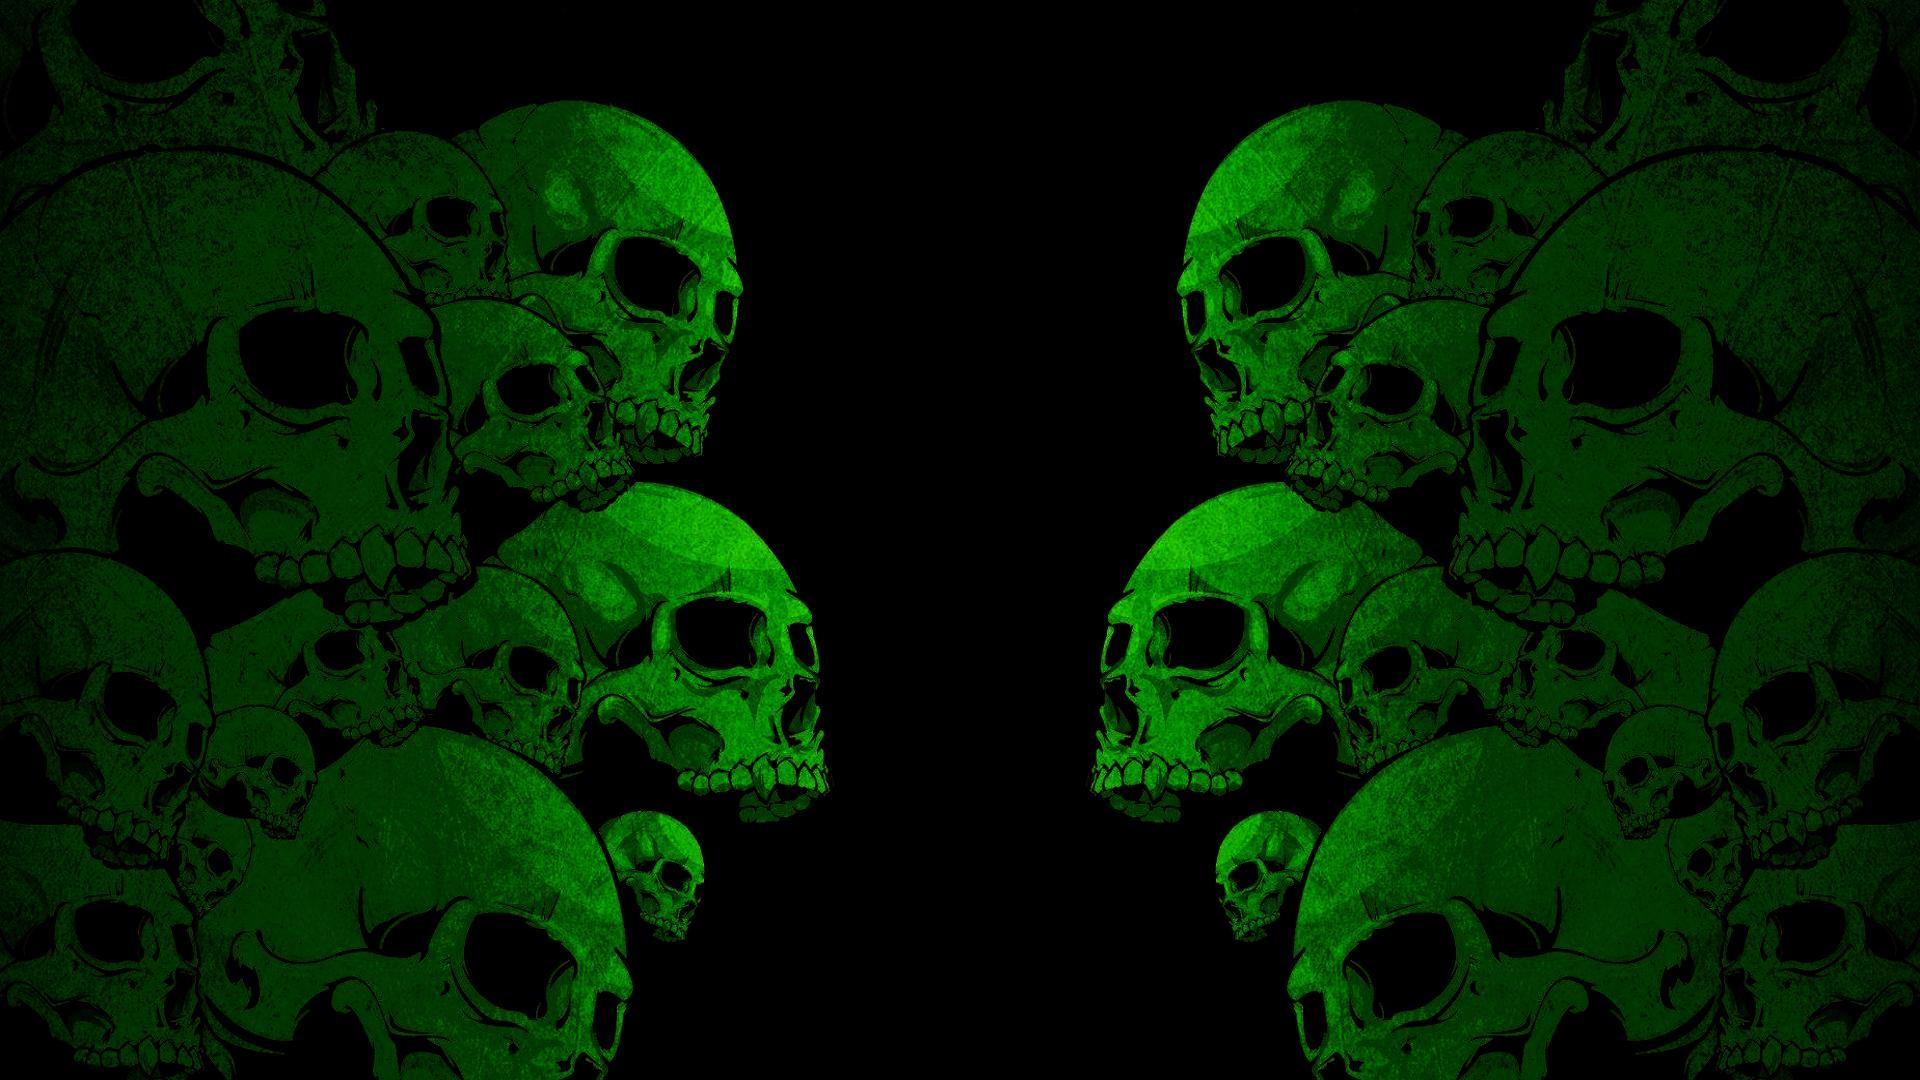 Images For Green Skull Wallpaper Hd 1920x1080